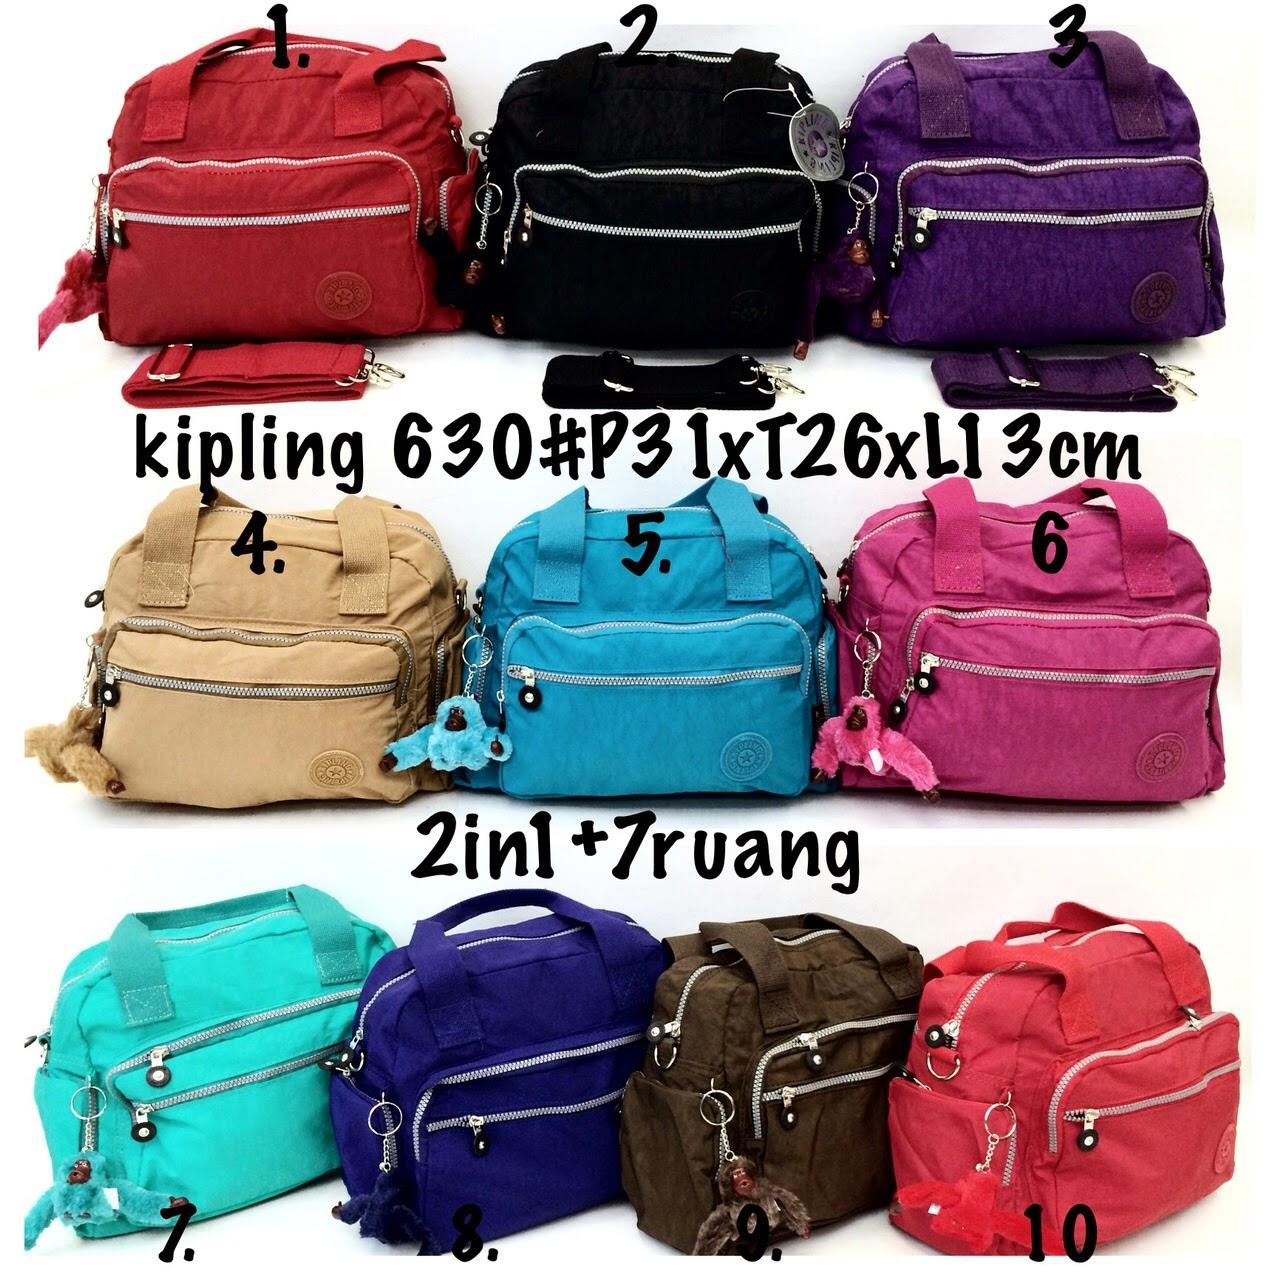 Tas Kipling Selempang 4sletpouch Kipling Polos - Beli Harga Murah 68f158e552